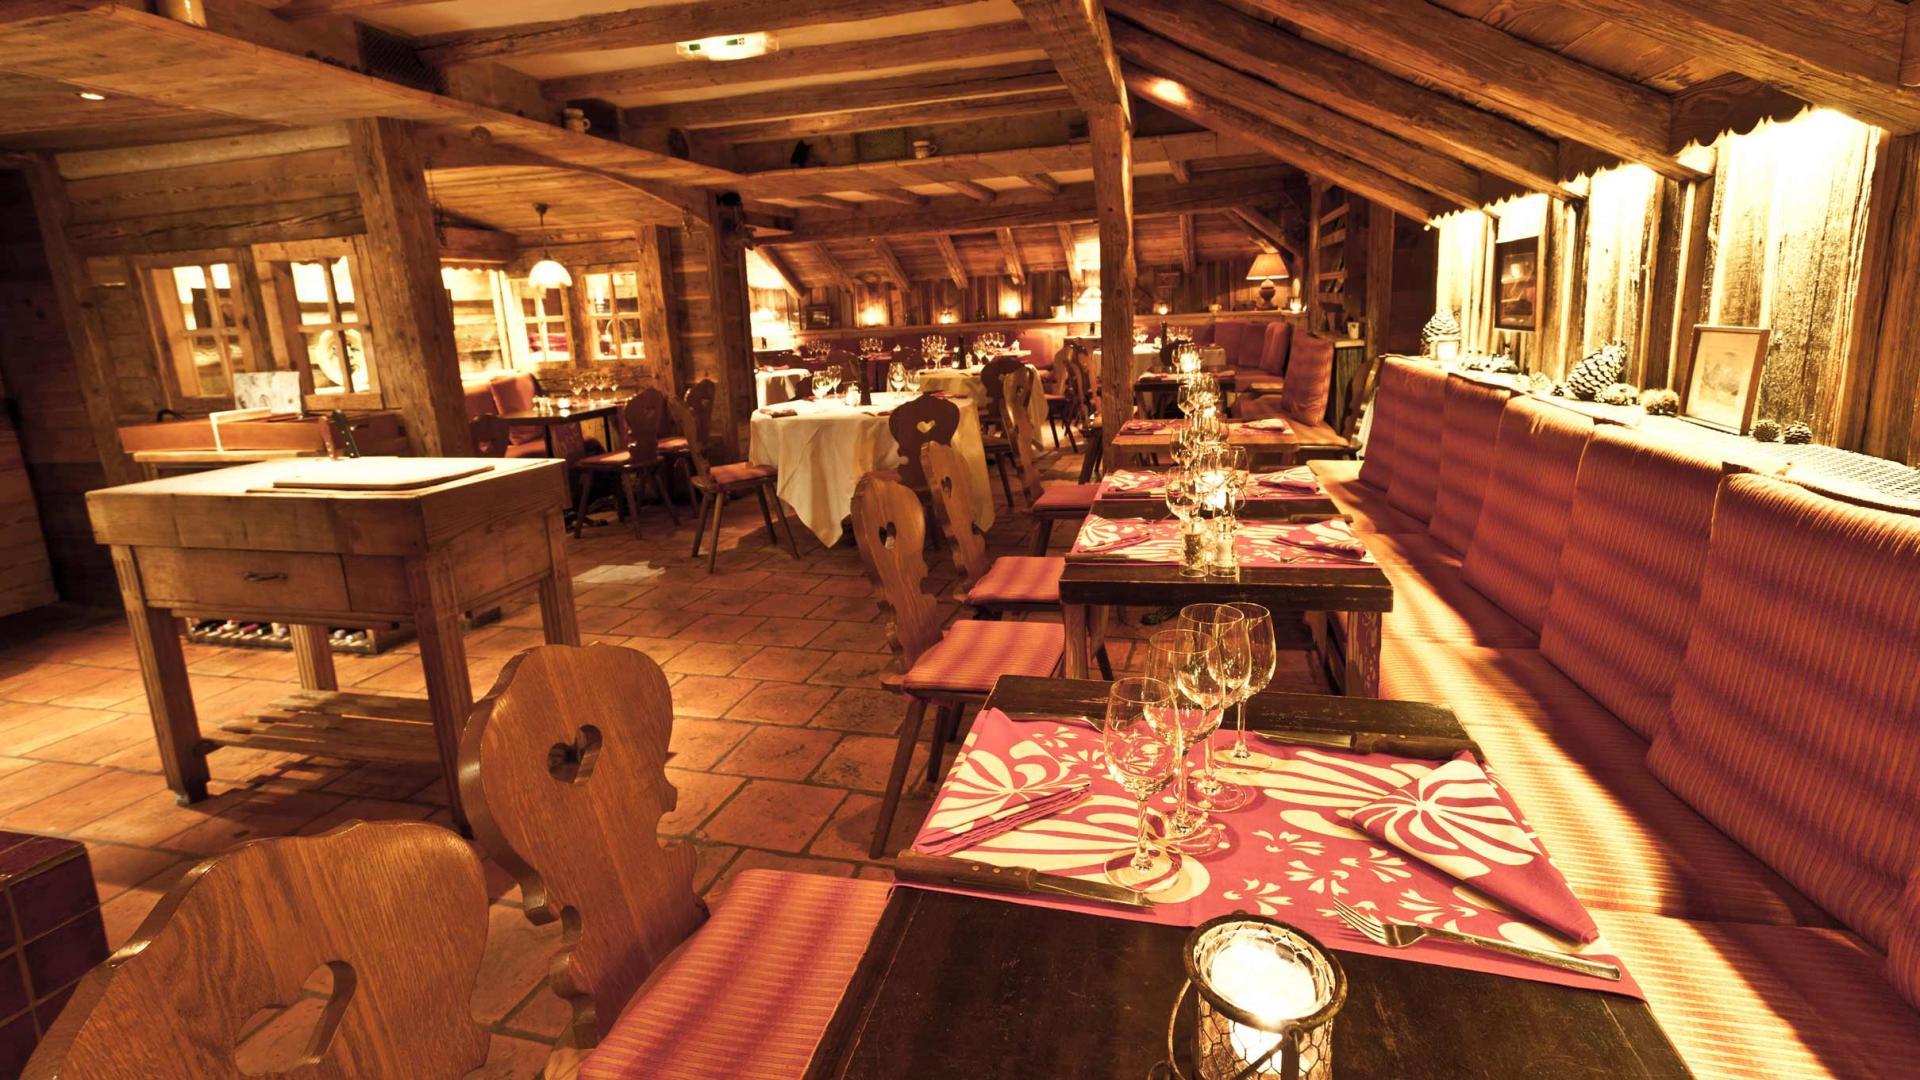 http://hotelblizzard.com/sites/default/files/styles/grand/public/restaurant-05_0.jpg?itok=CGg4Kvkf